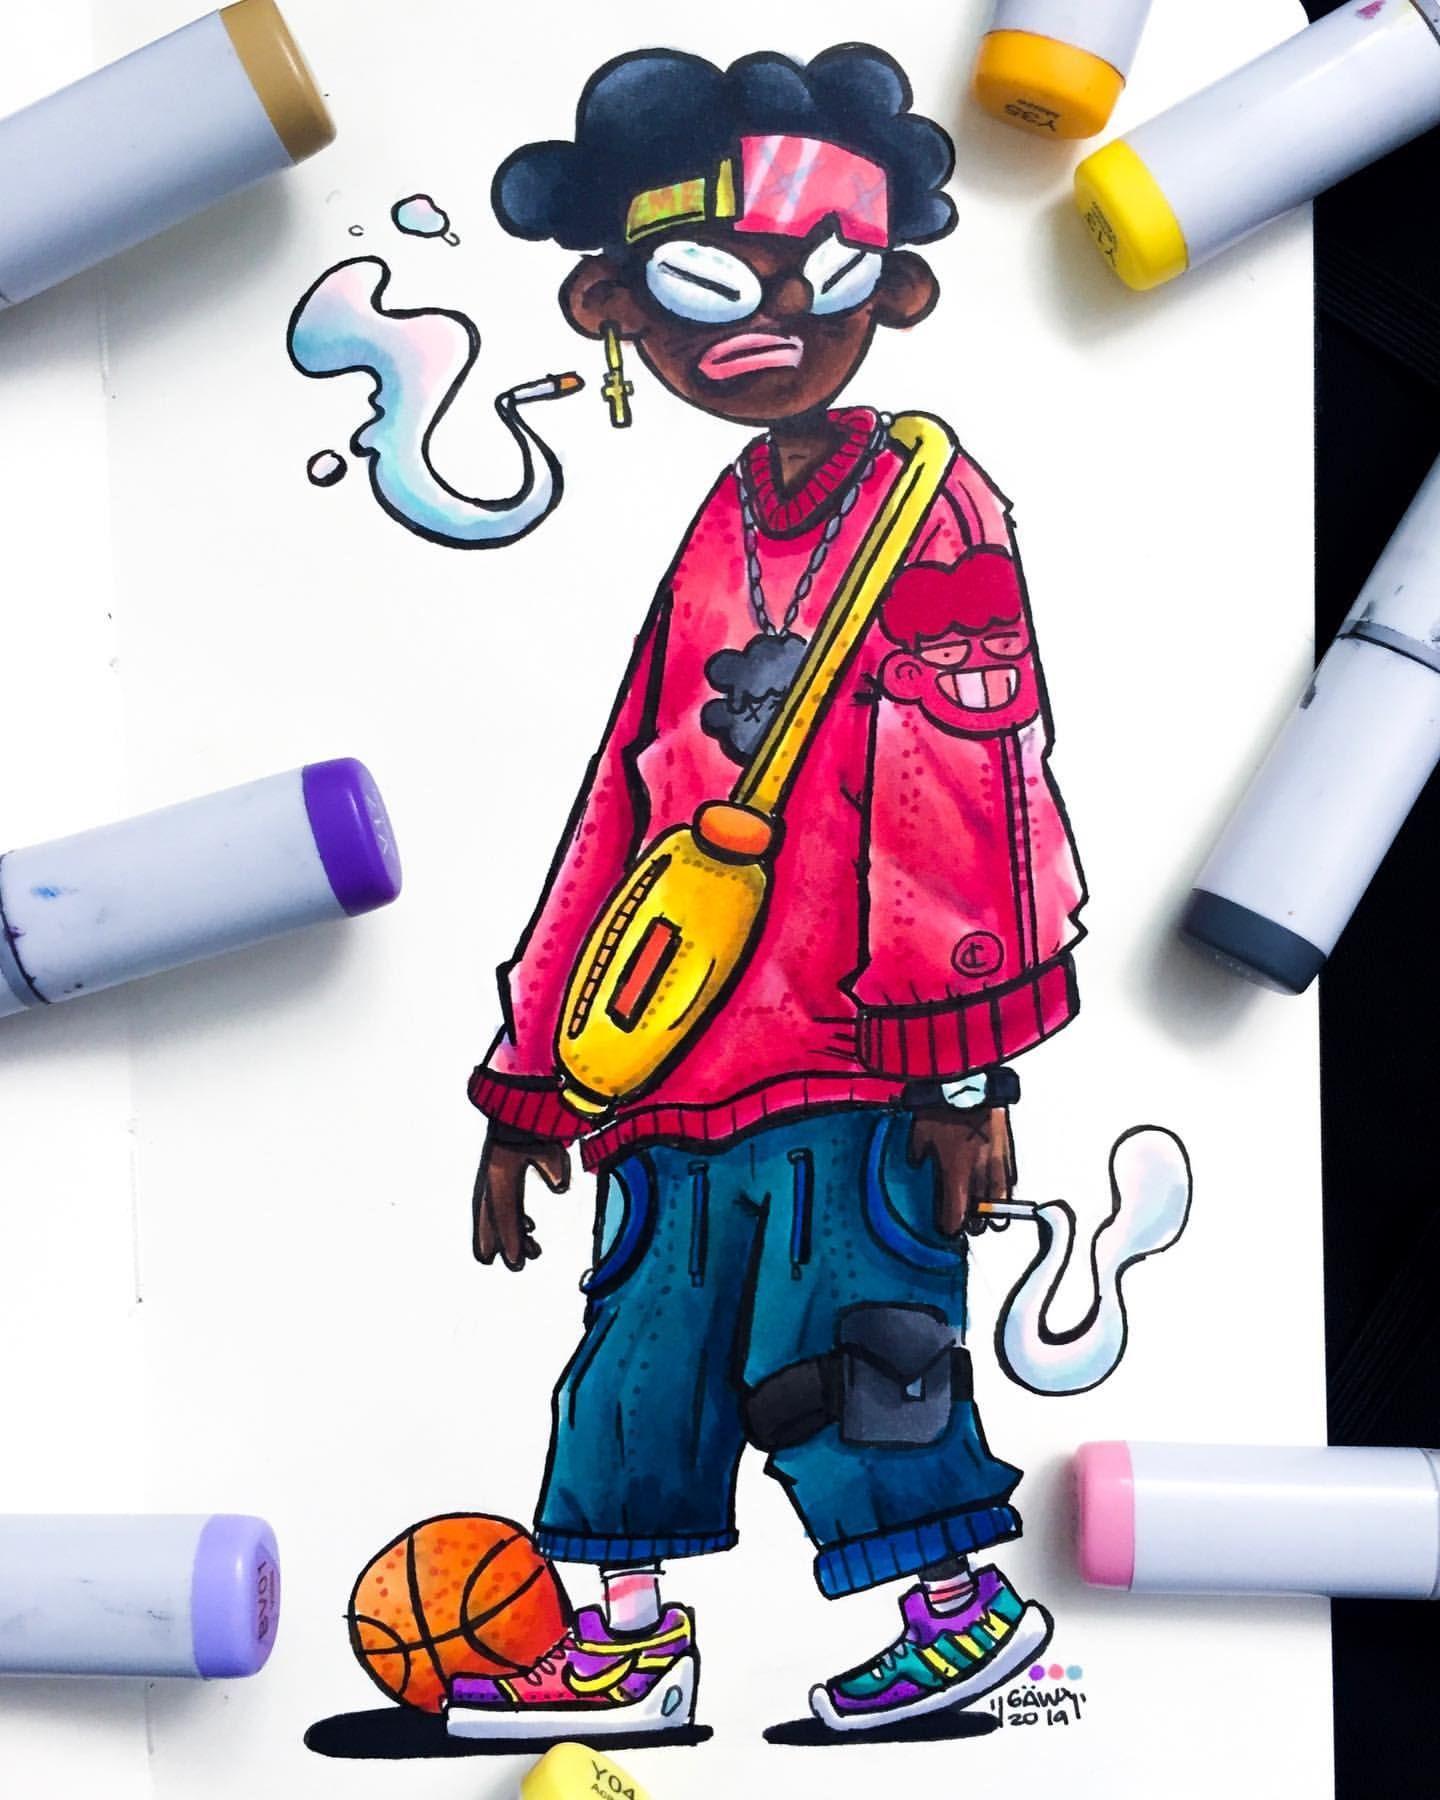 Gawx Art Charecters Busqueda De Google Doodle Art Drawing Doodle Art Designs Graffiti Style Art